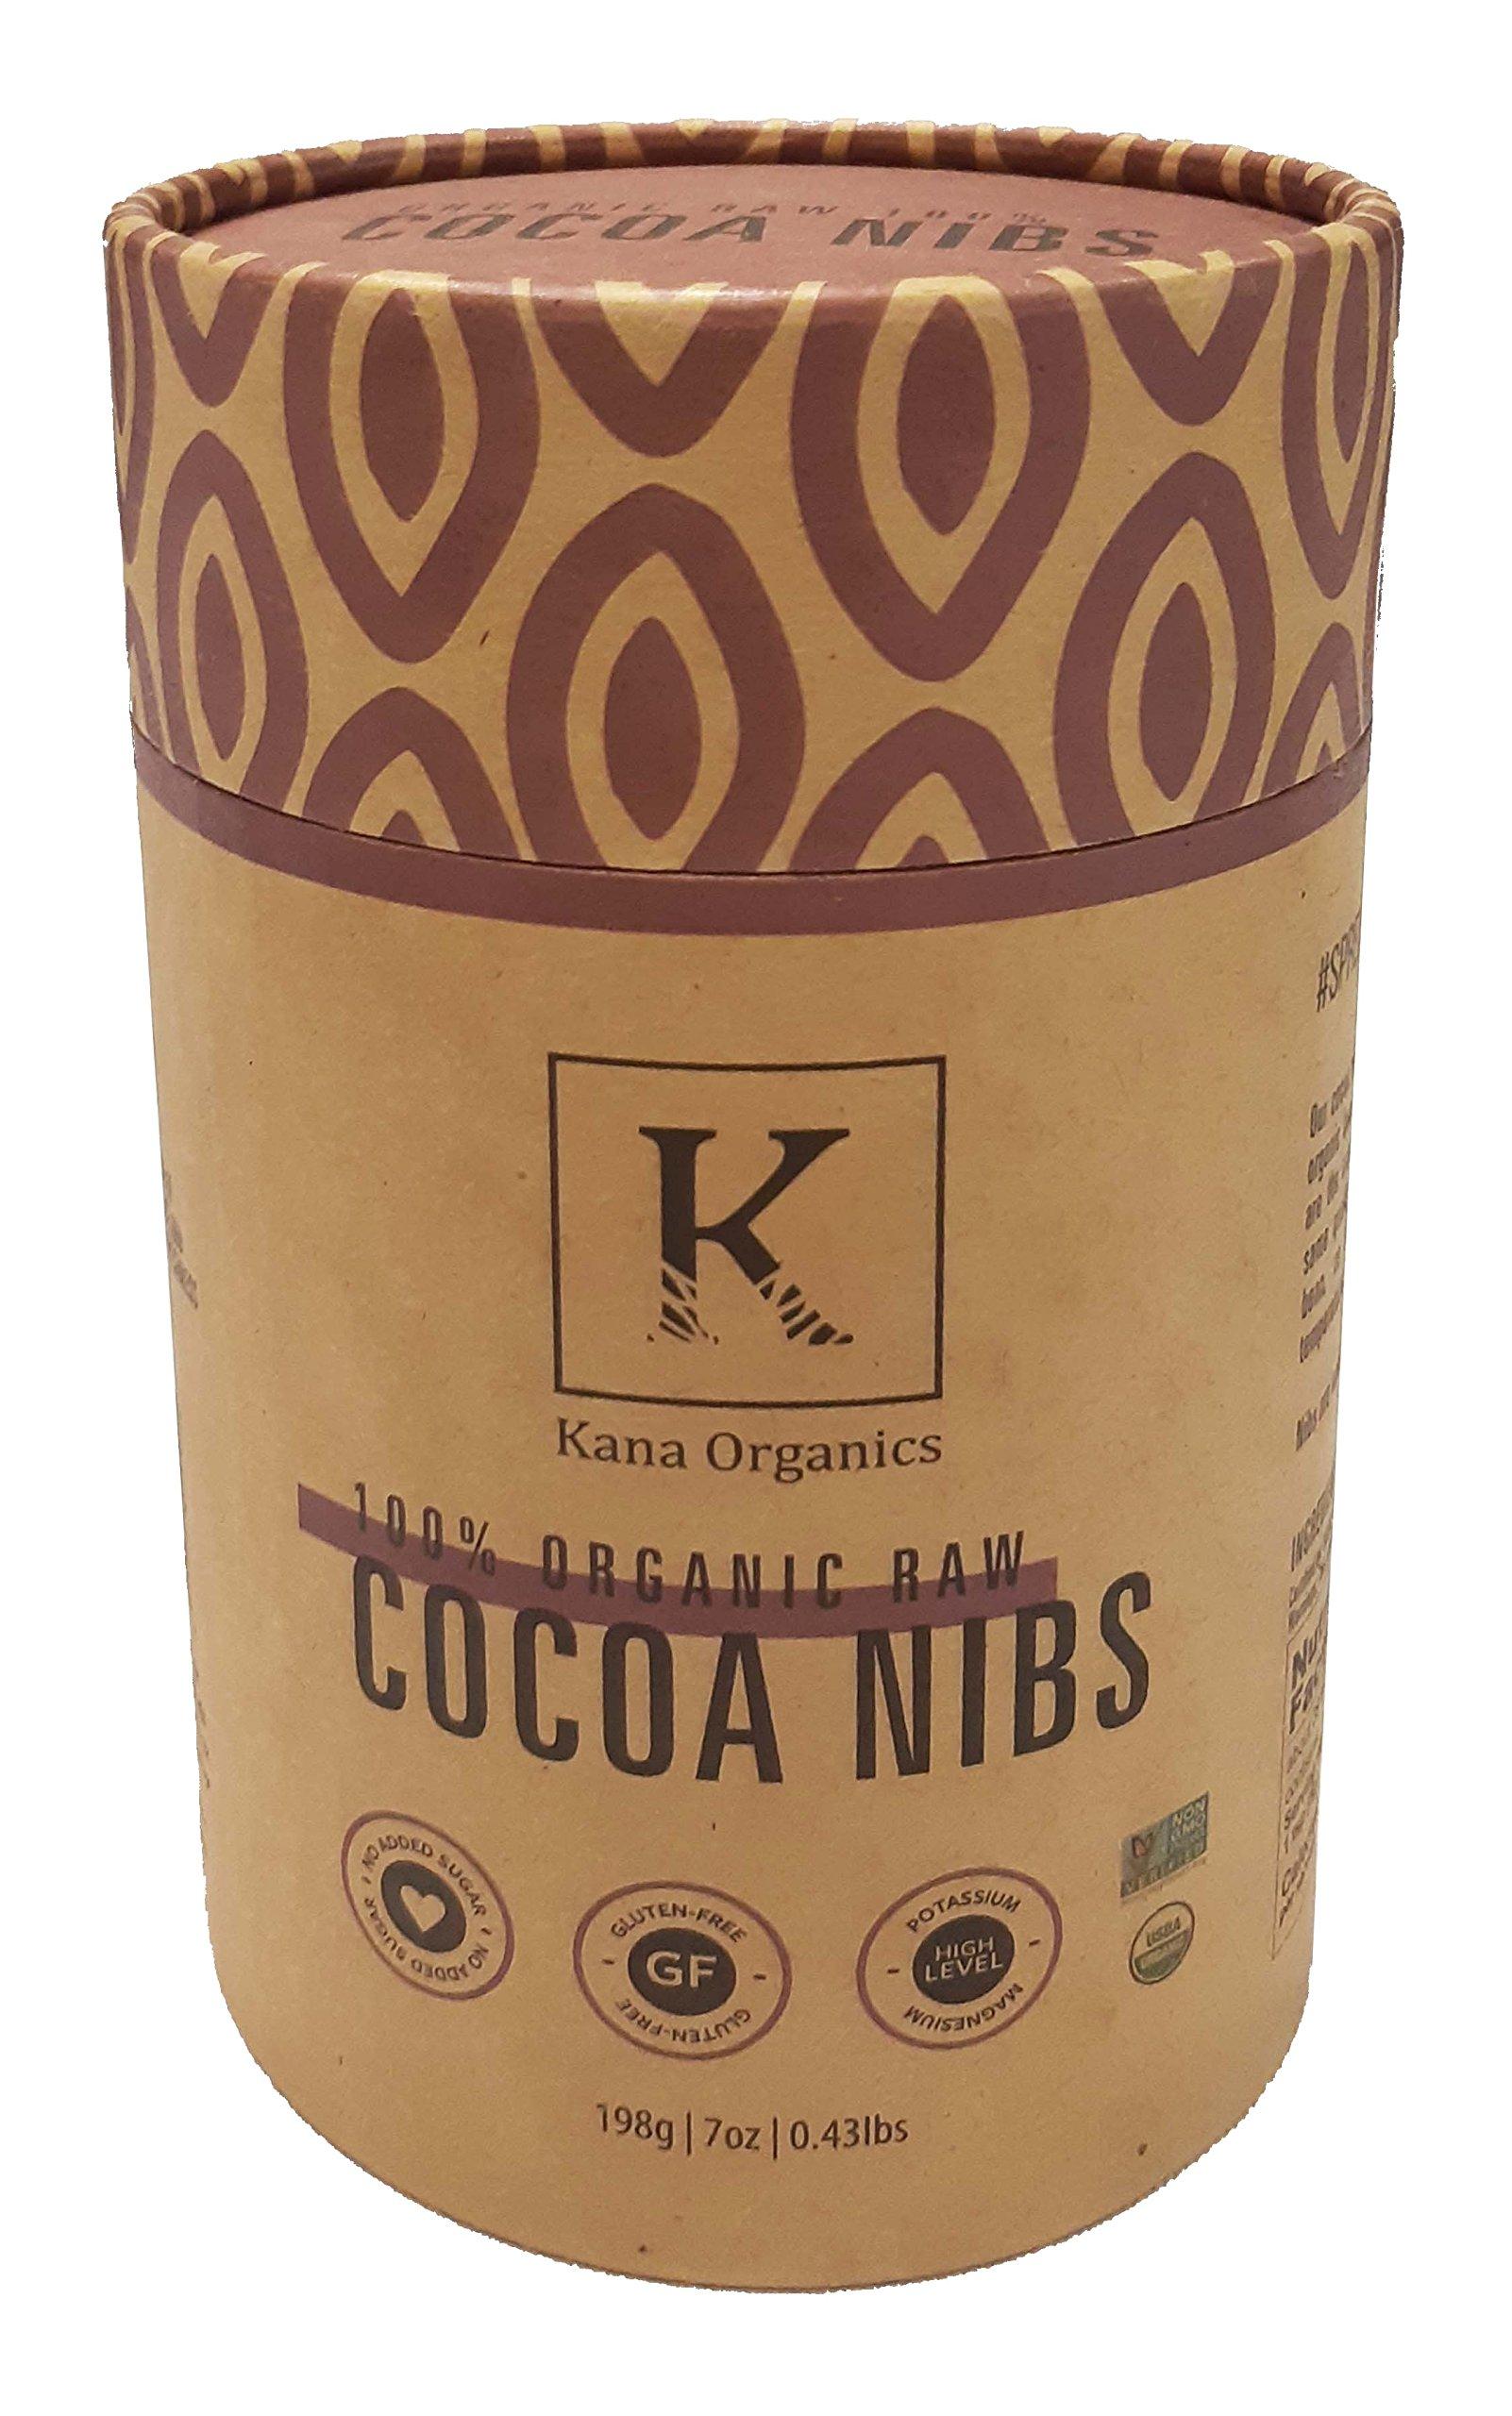 Healthy Organic Cocoa Nibs - Gluten free and Vegan friendly by Kana Organics